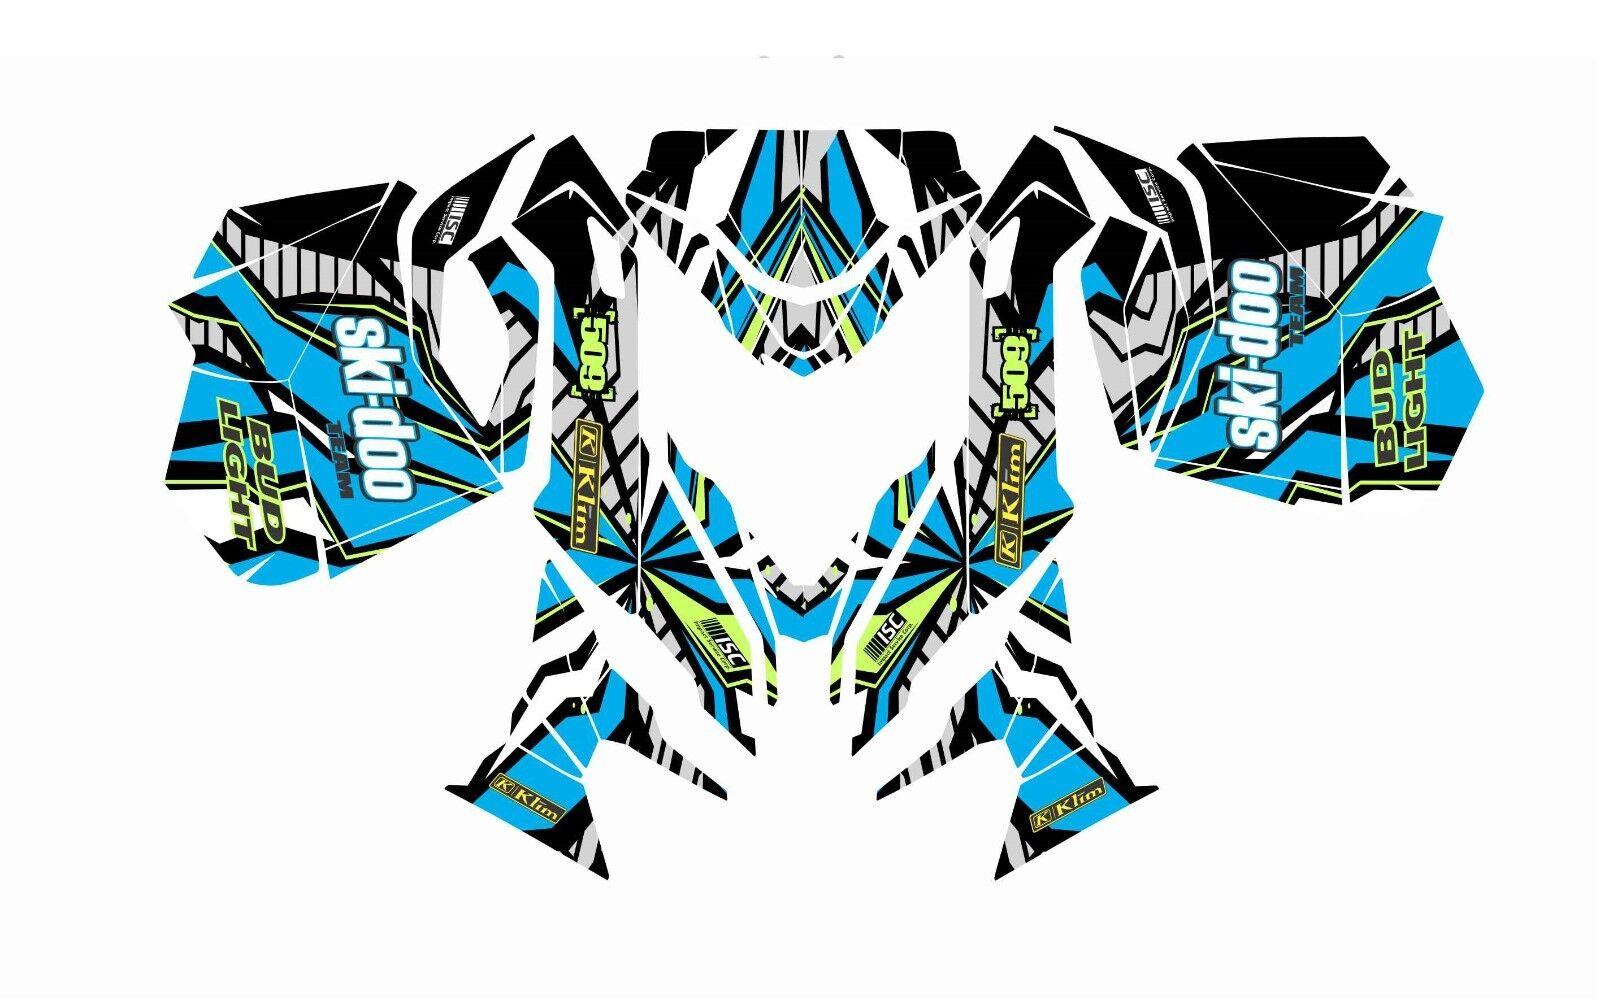 SKI DOO BRP REV  XM rs SUMMIT GRAPHICS DECAL WRAP 163 154 146 137 121 blue 13 18